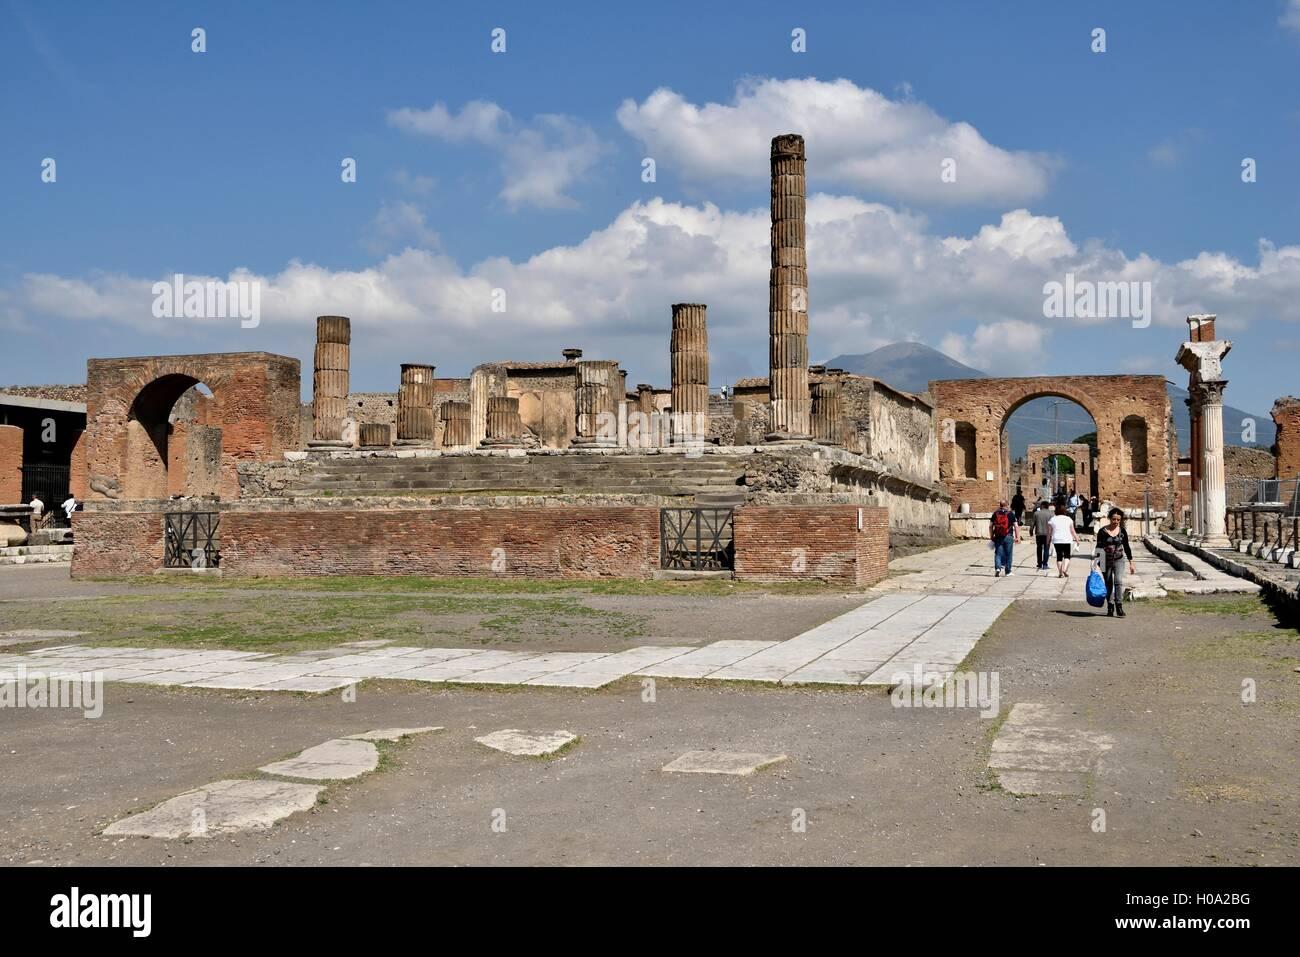 Forum, ancient city of Pompeii, Campania, Italy - Stock Image